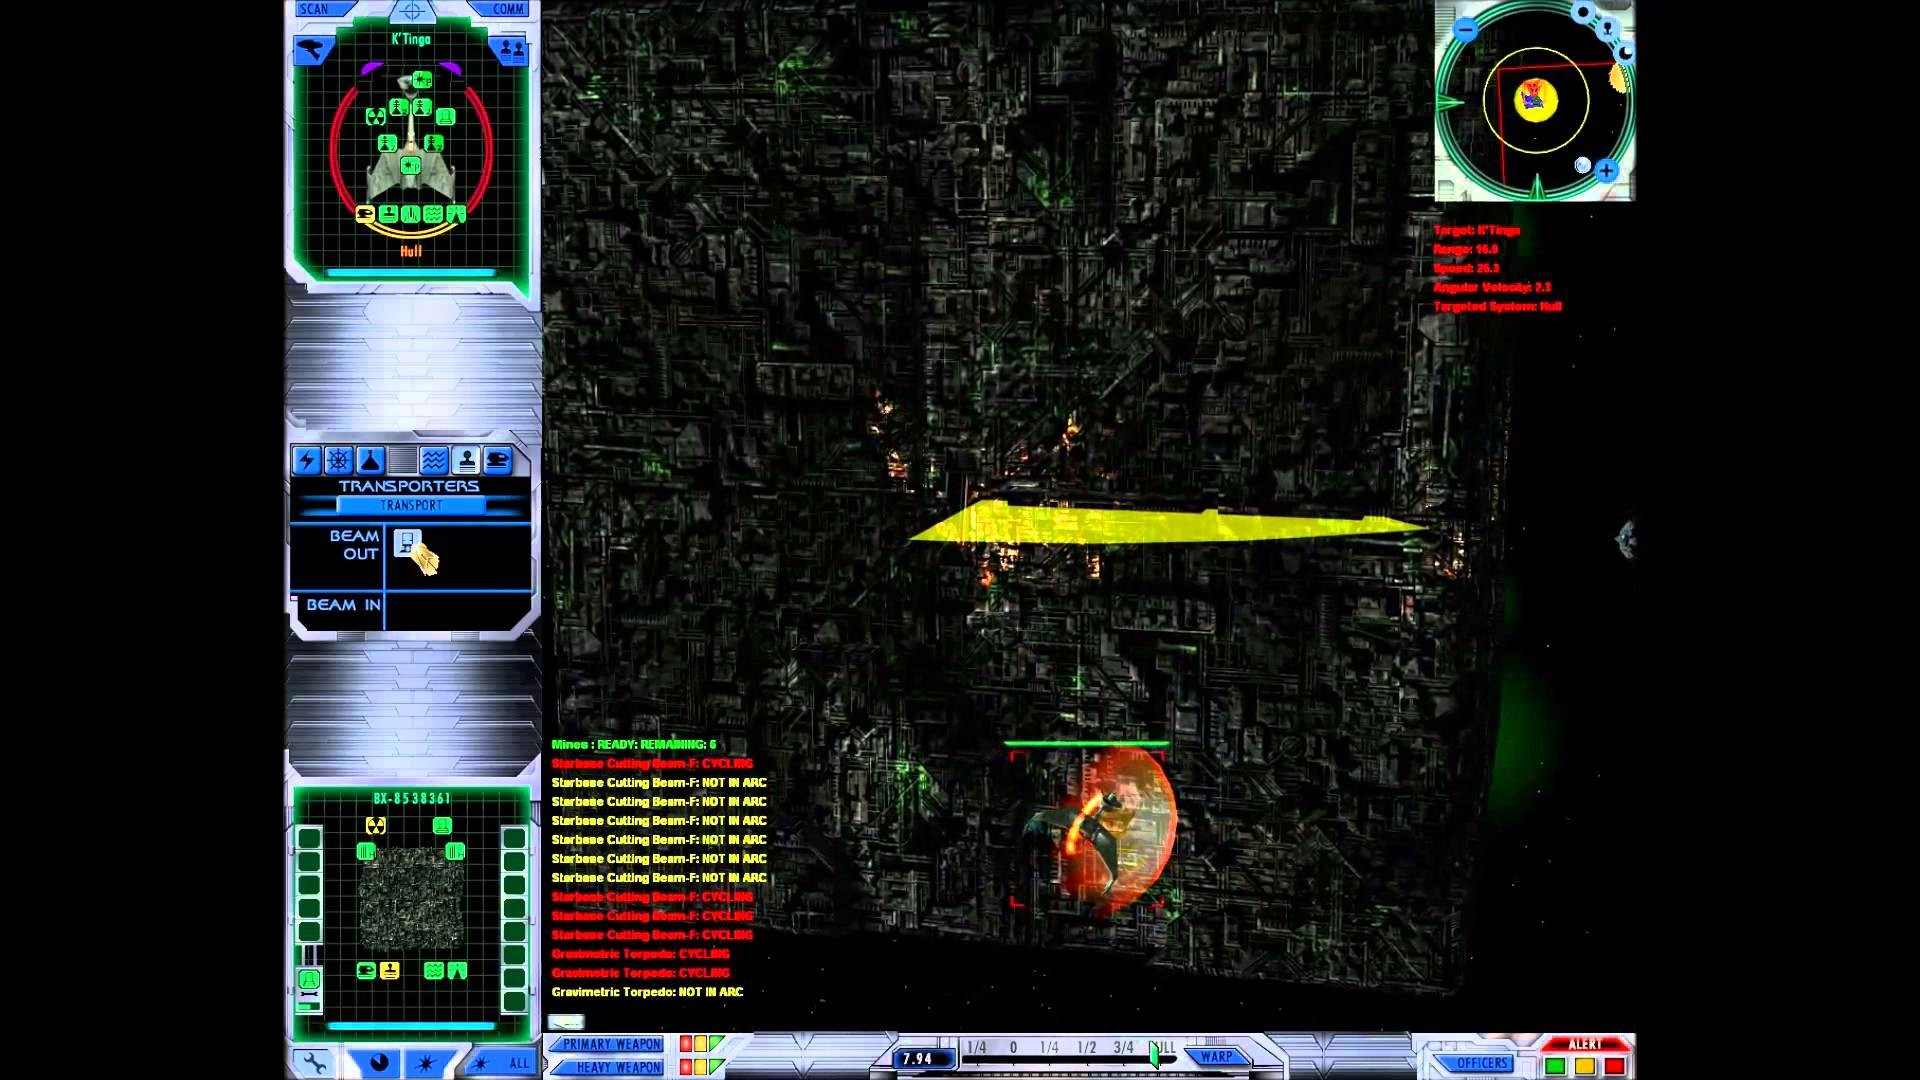 Let's Play Star Trek Starfleet Command 3 – Borg Mission 4 – Rexpansion 2009  Mod – YouTube